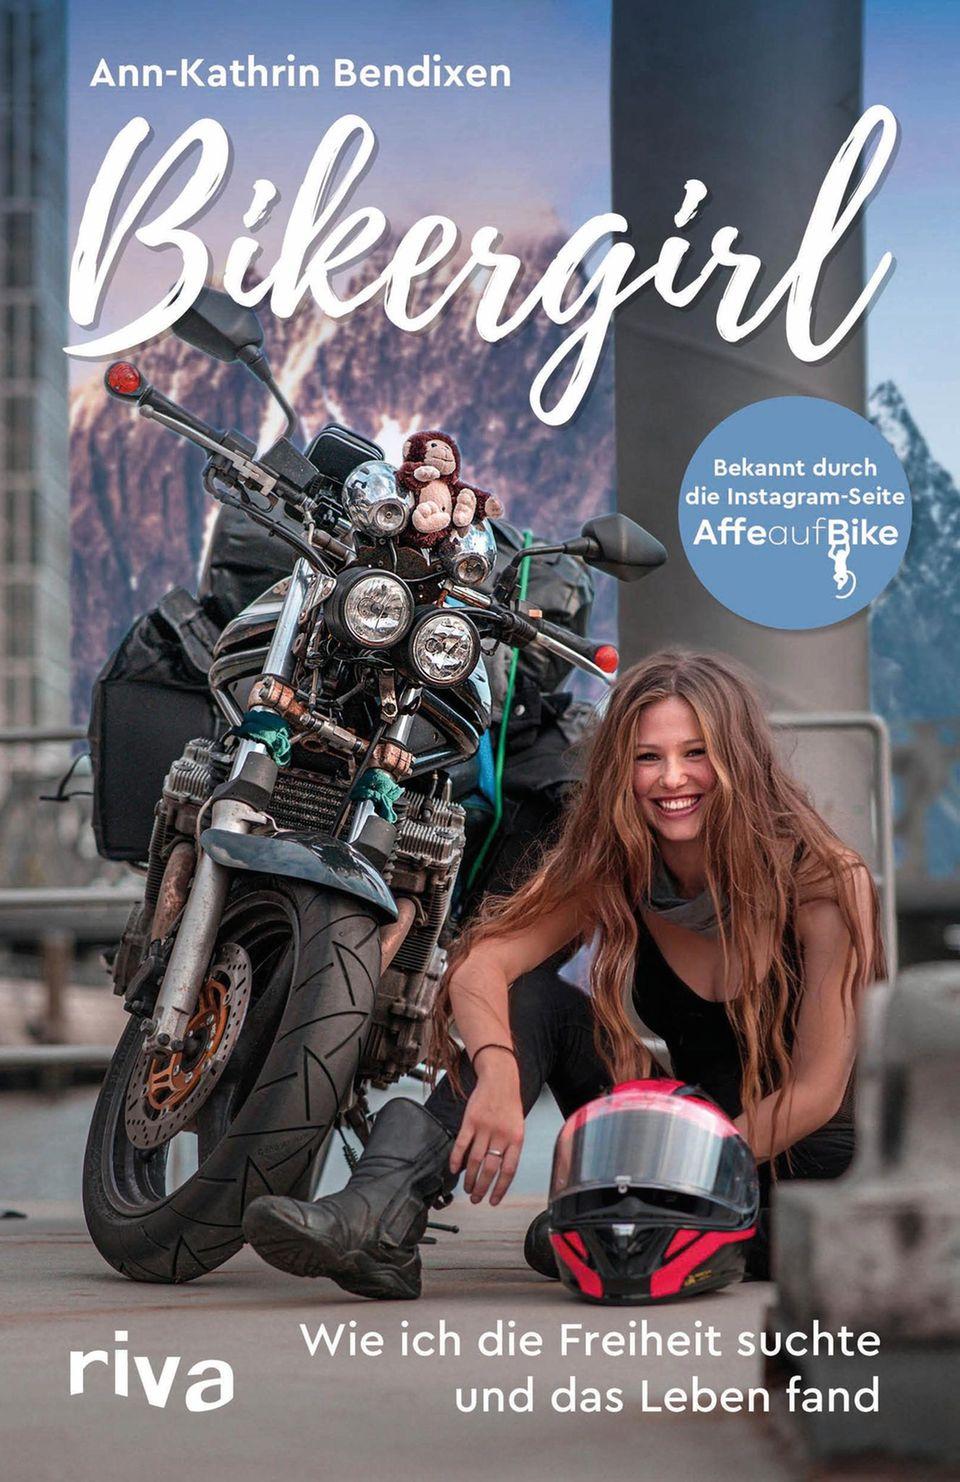 Bikergirl